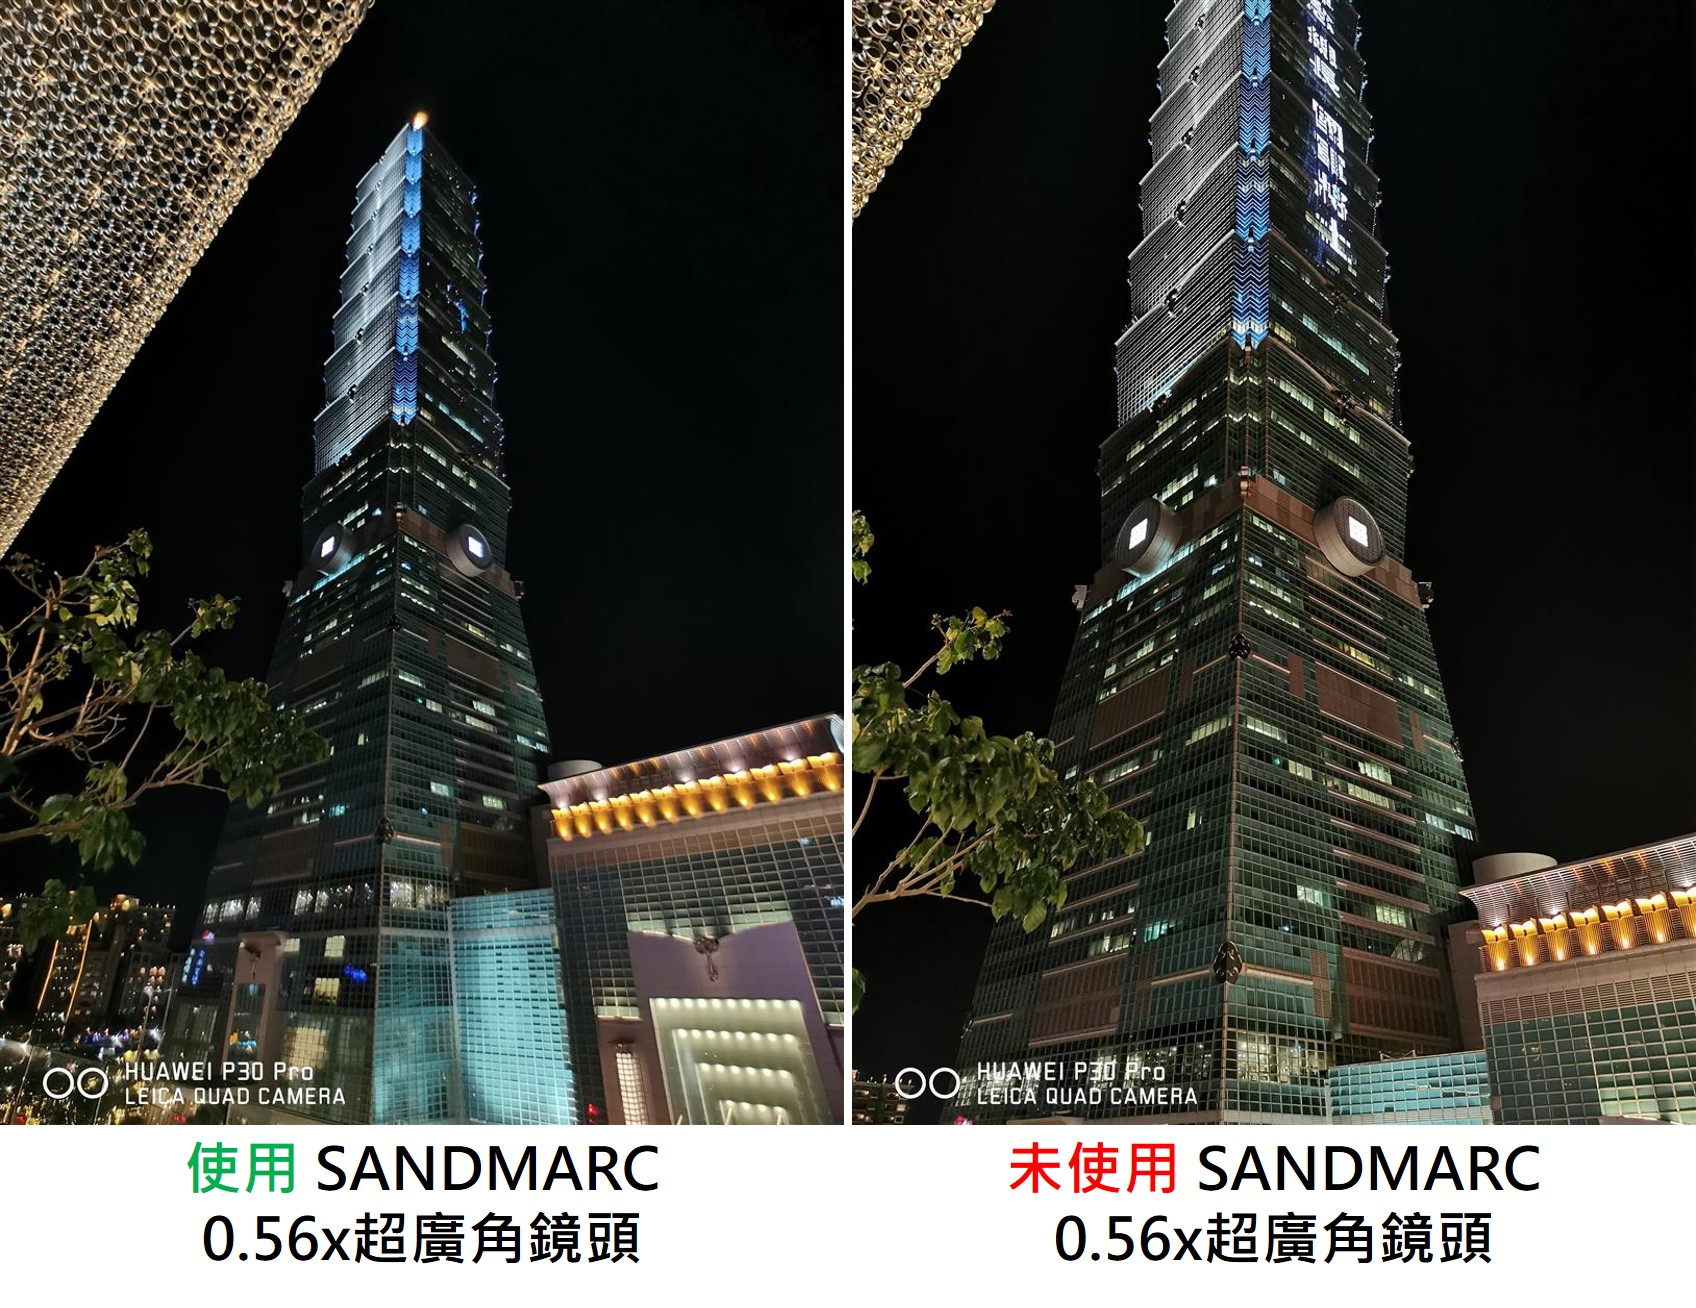 SANDMARC 0.56x